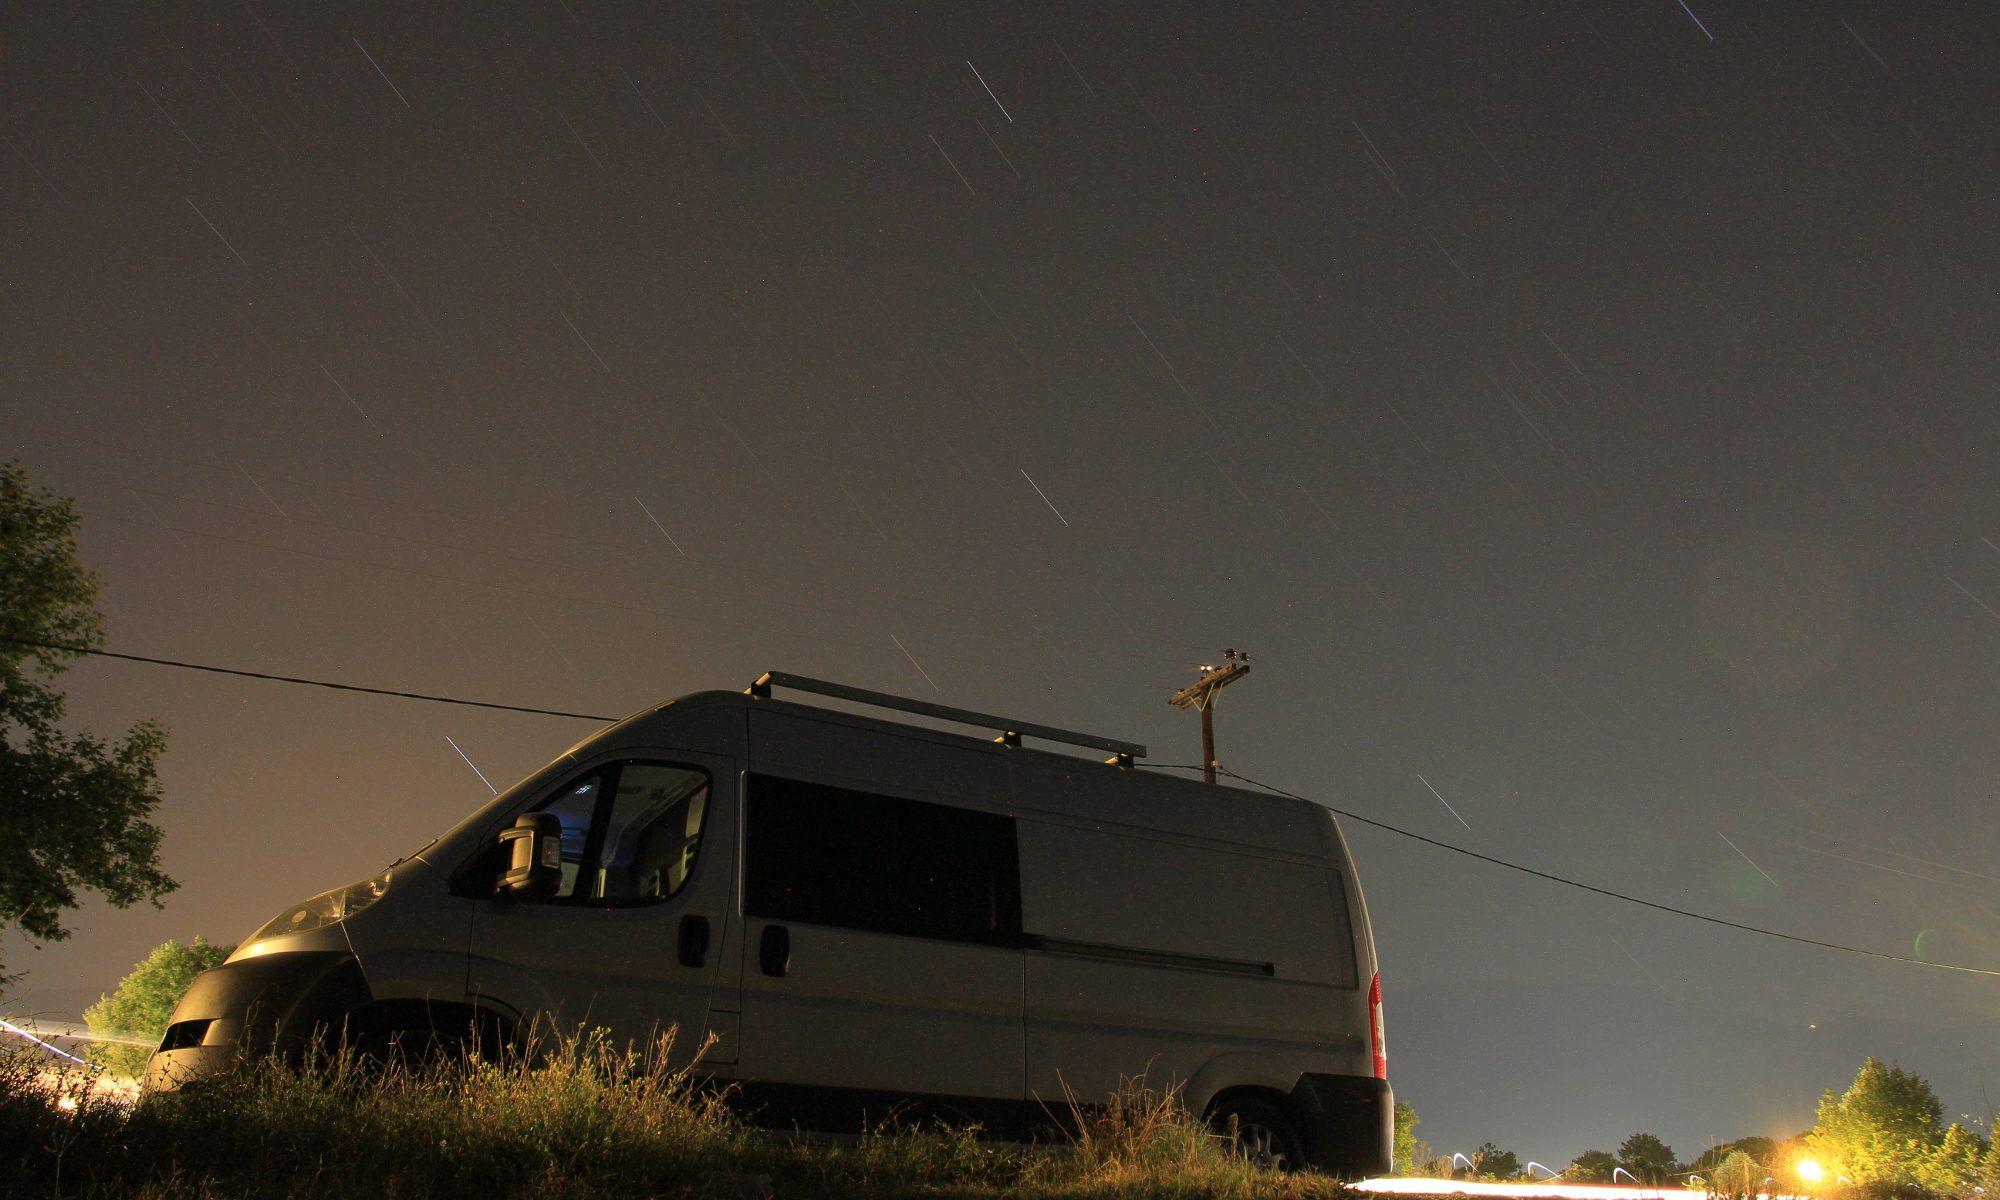 Long Exposure Motorhome at Night